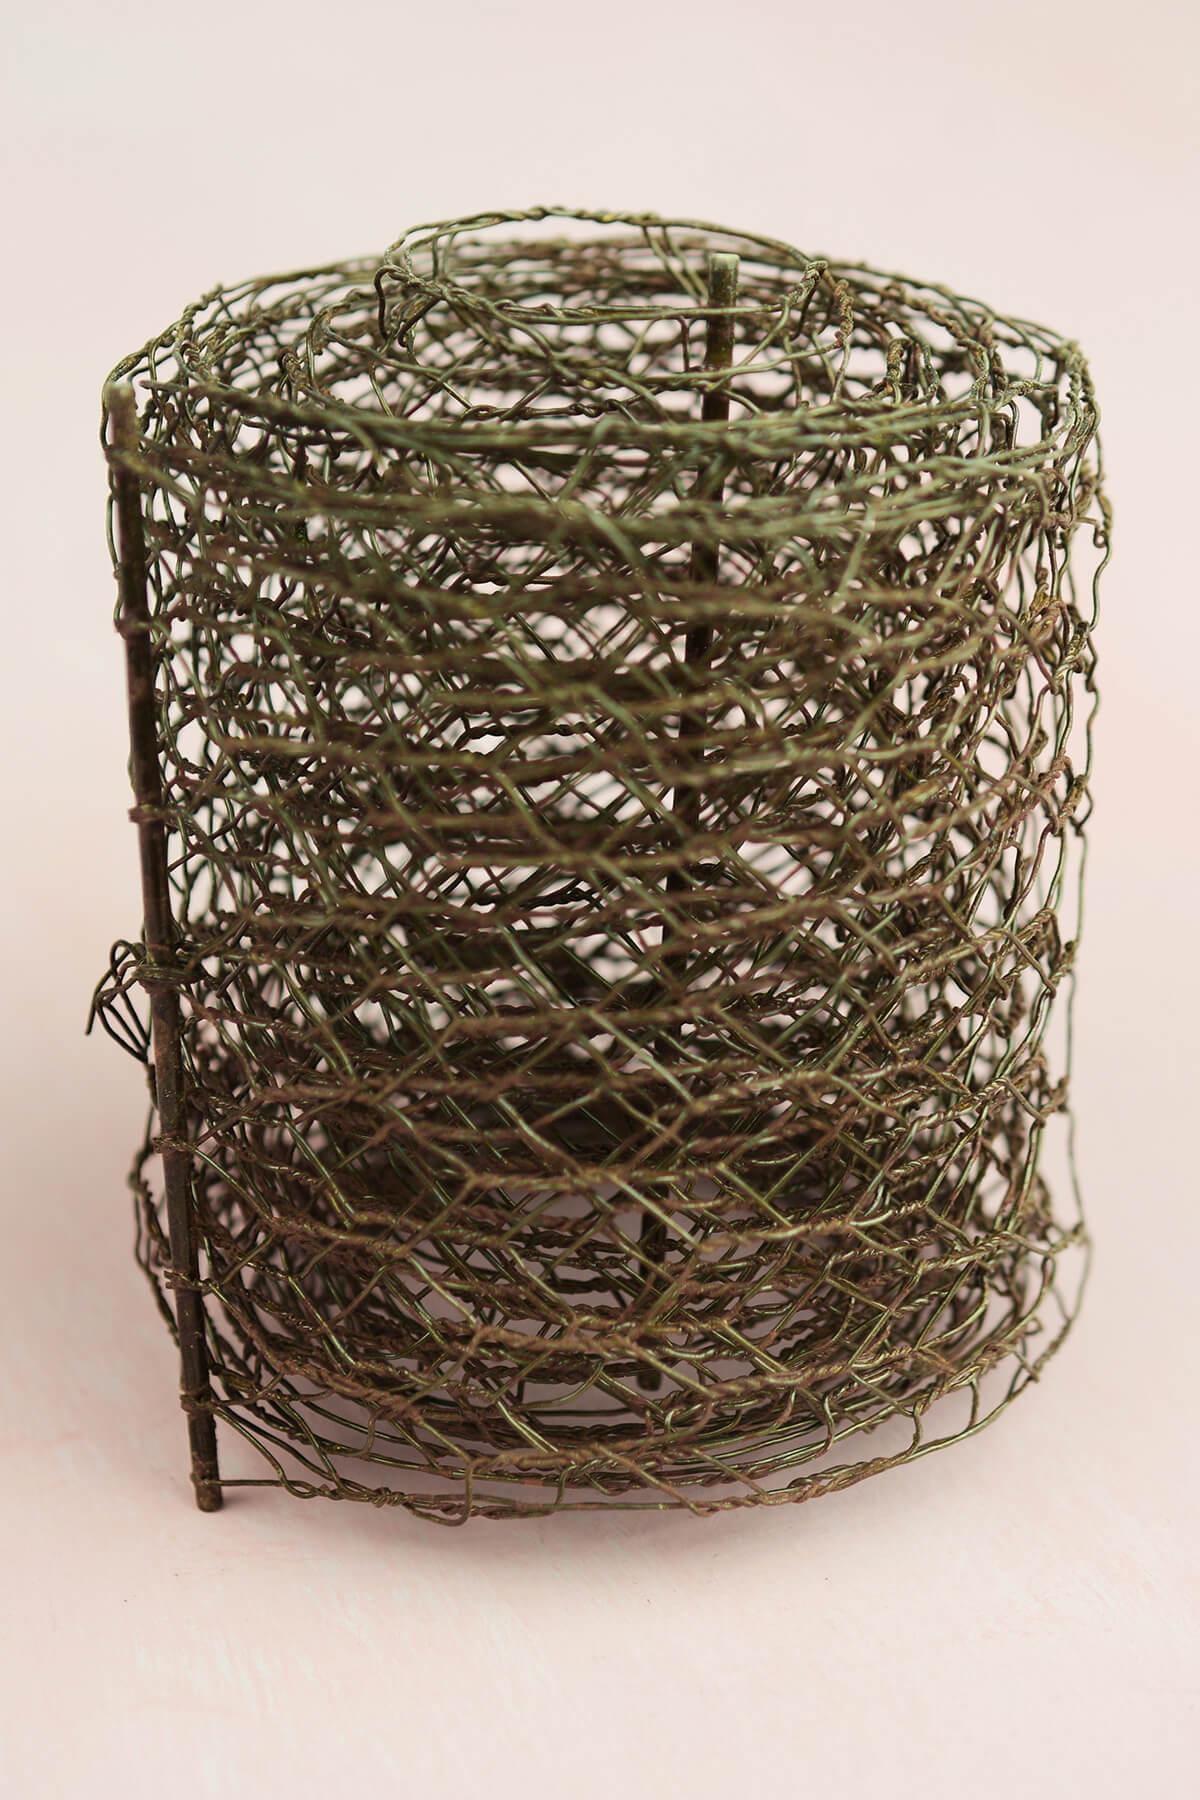 Rustic Chicken Wire 4in x 9yd